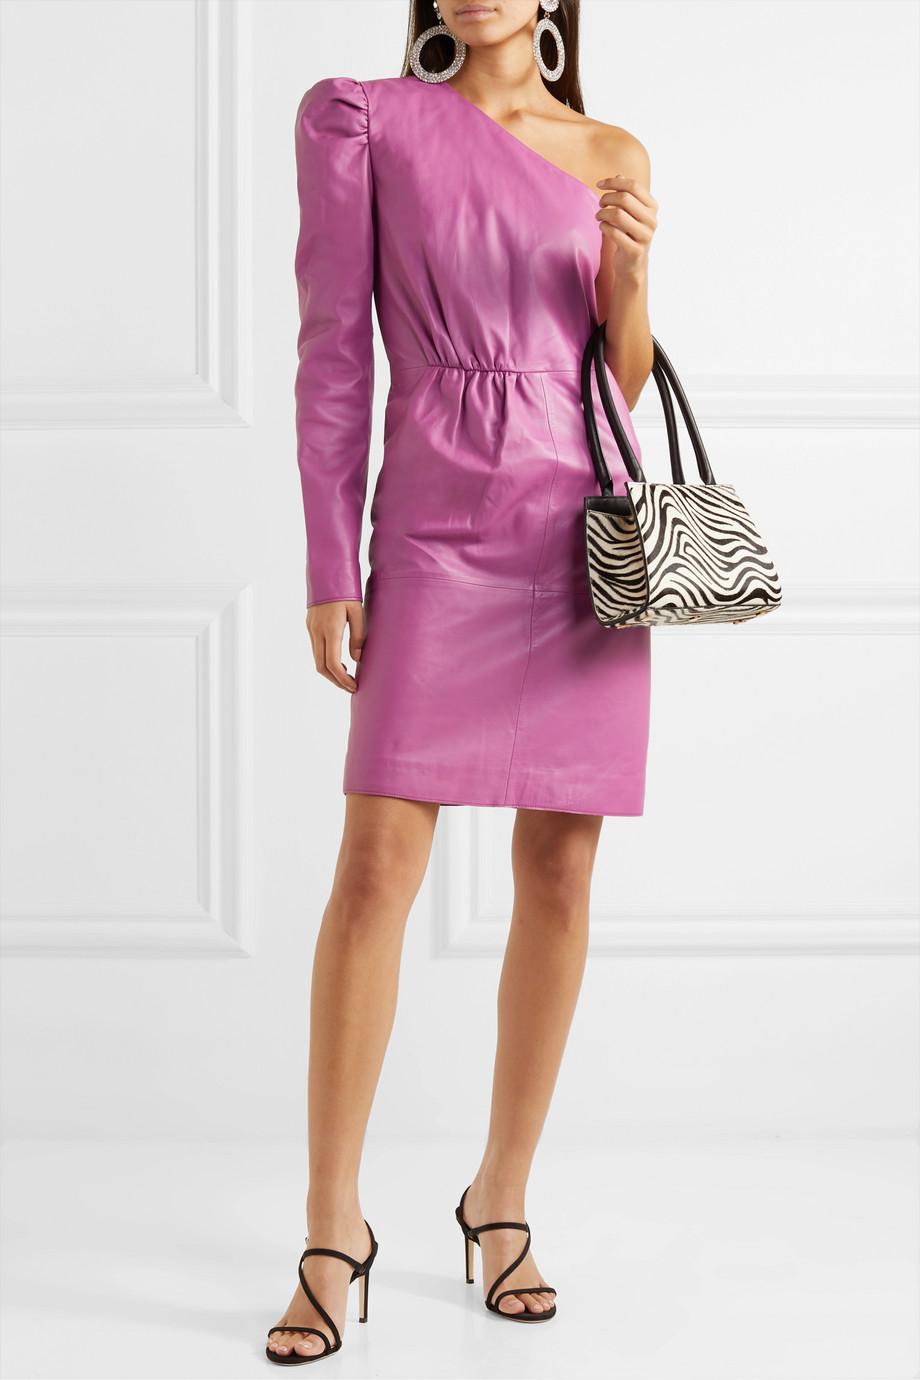 Stand Studio + Pernille Teisbaek Kayla one-shoulder leather mini dress